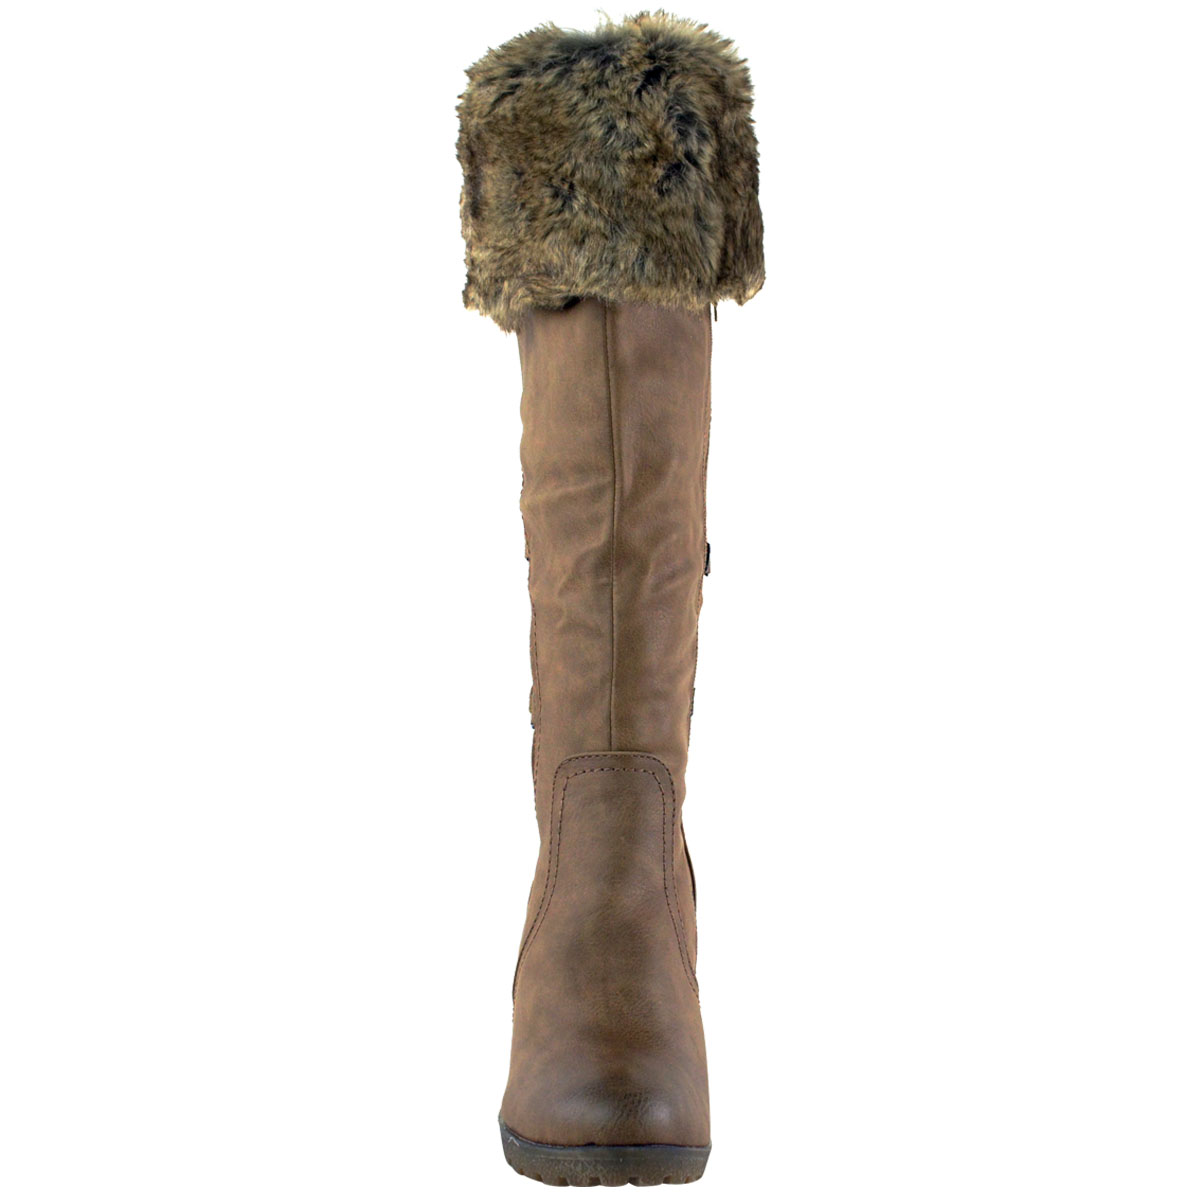 Womens-Ladies-Wedge-Low-Heel-Winter-Knee-Boots-Warm-Faux-Fur-Fleece-Size-UK thumbnail 10